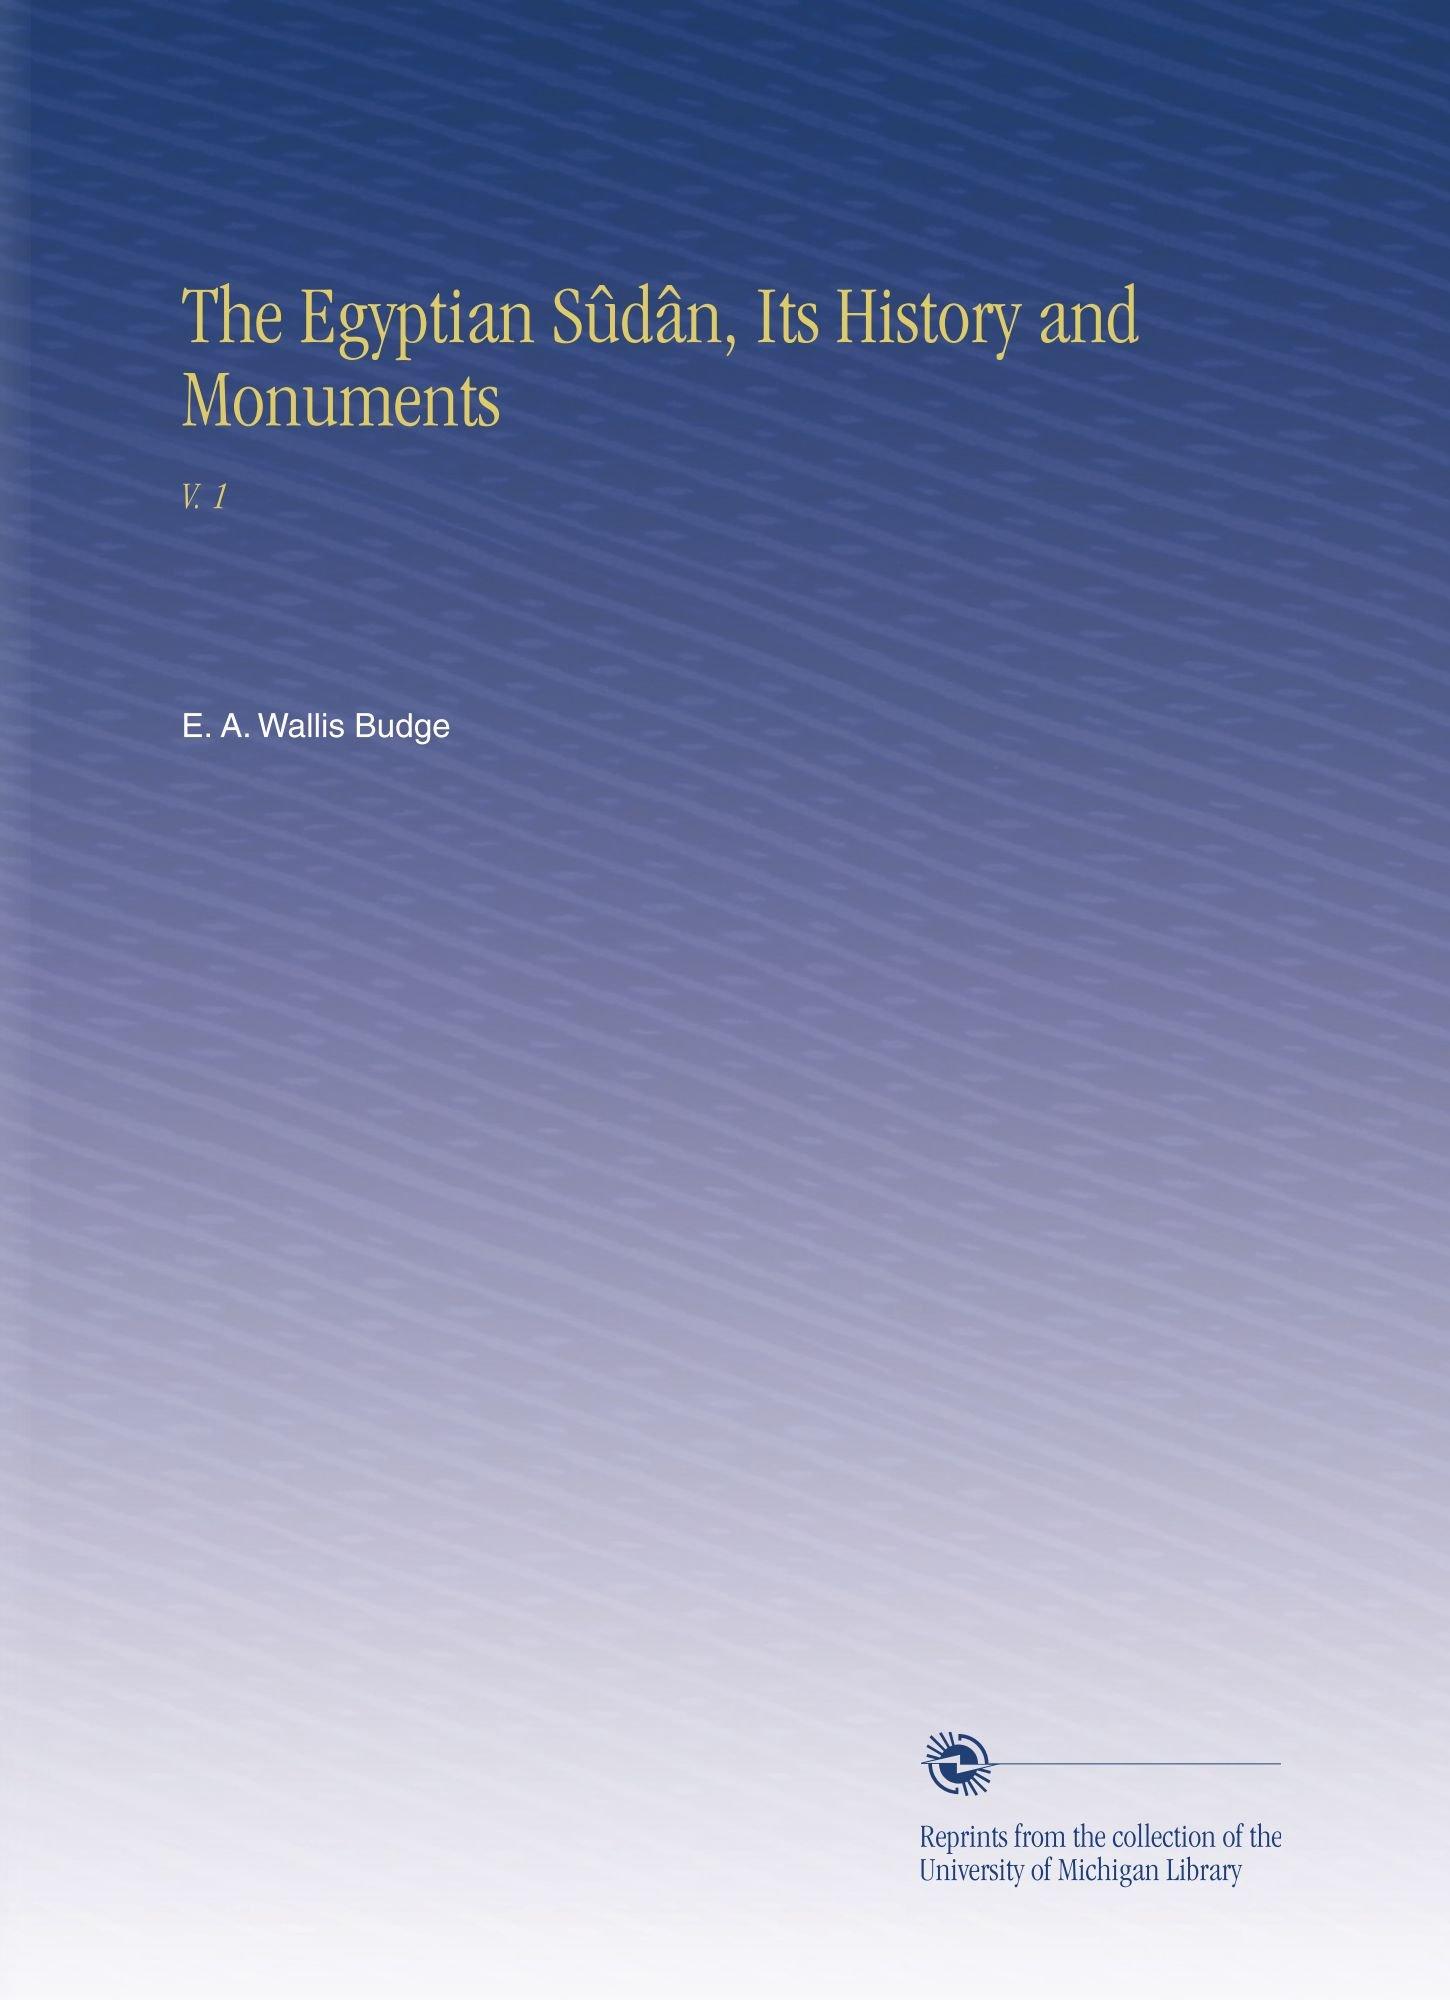 The Egyptian Sûdân, Its History and Monuments: V. 1